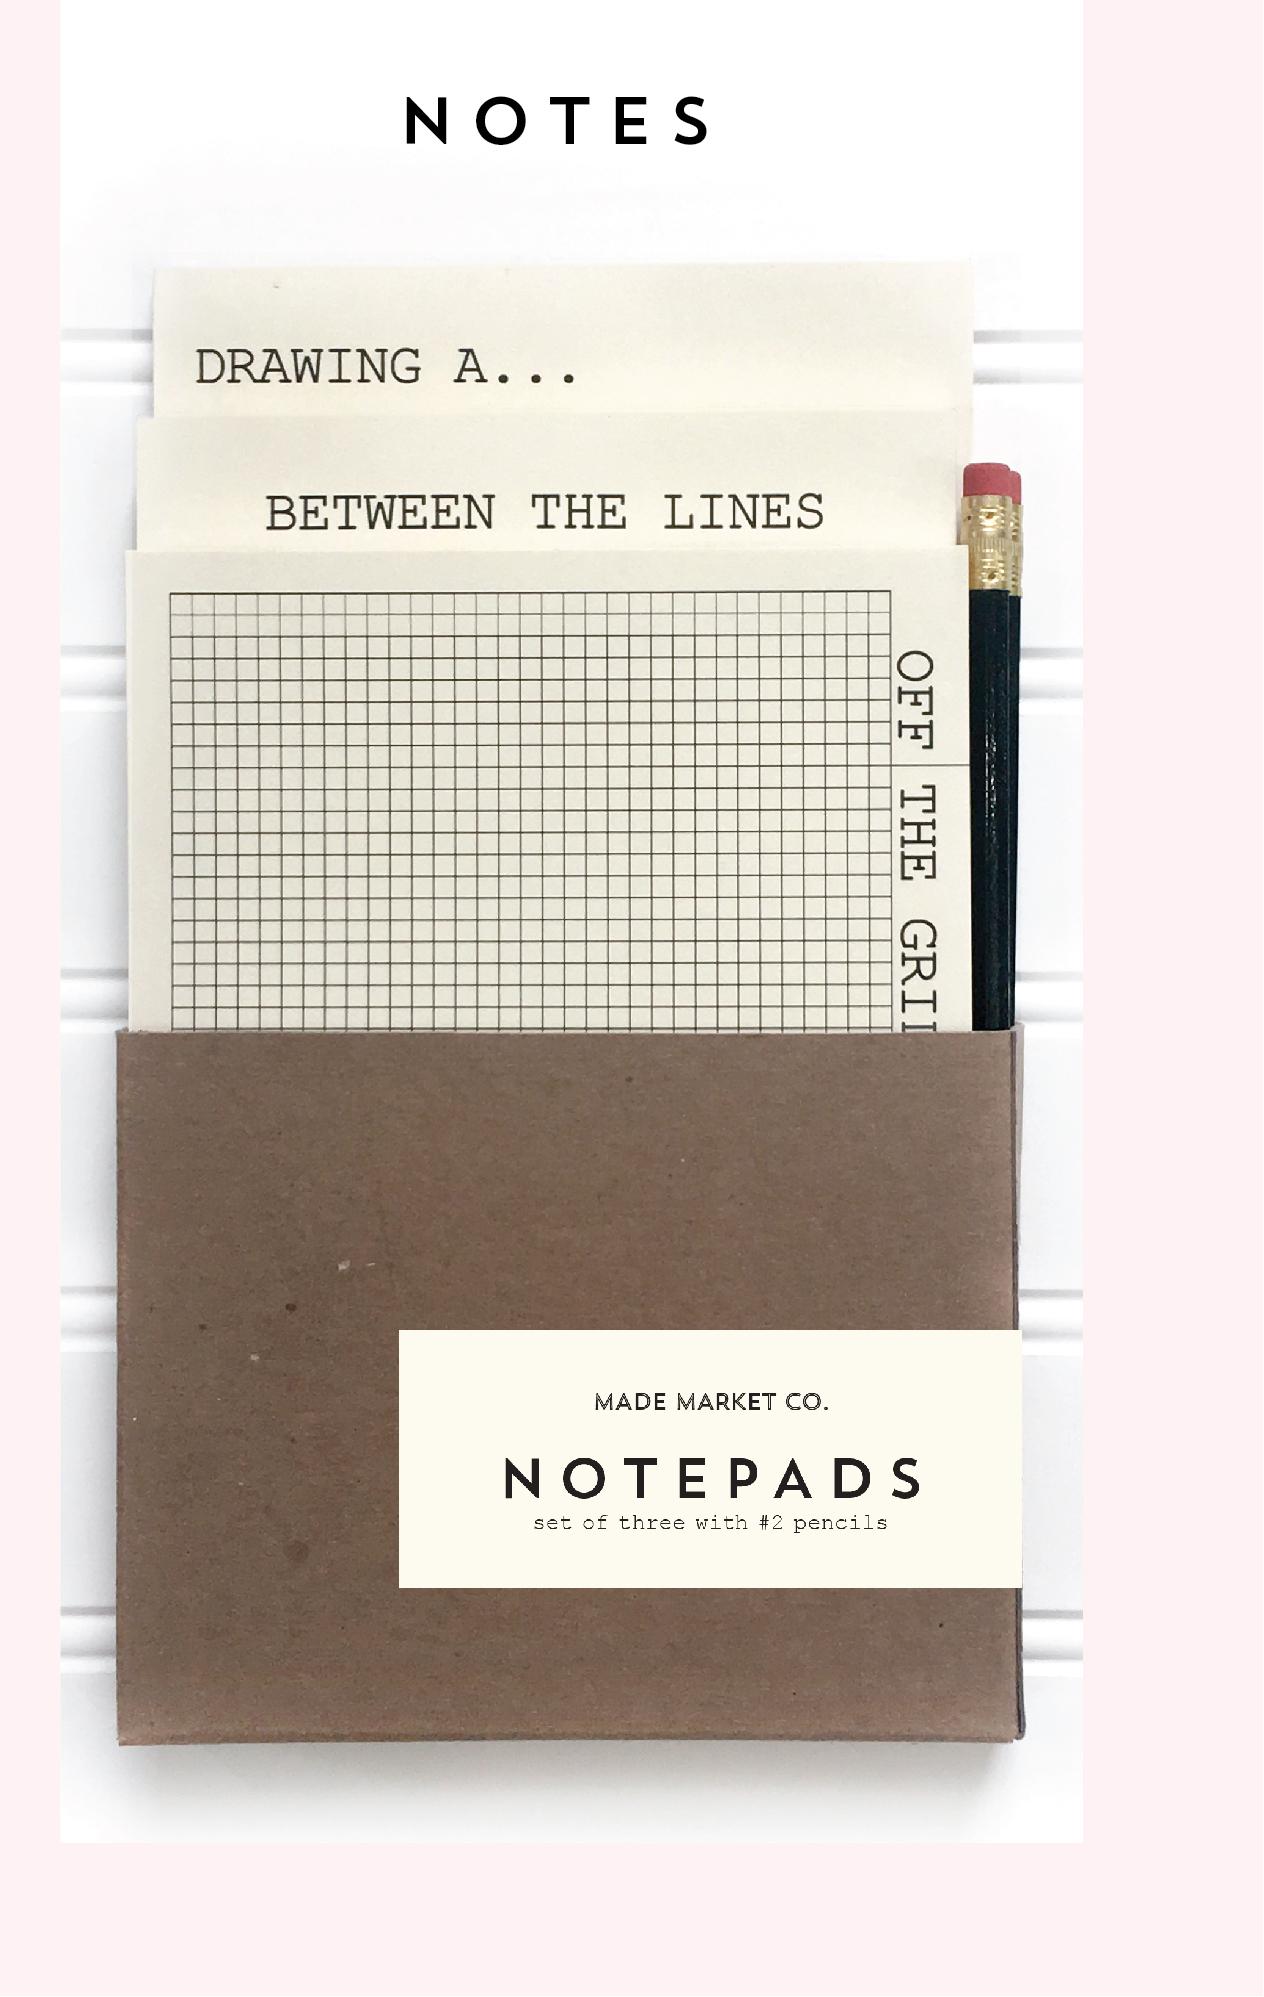 made-market-co.-internal-page-06.21.19-01-6.-notepads-6.-notepads.jpg